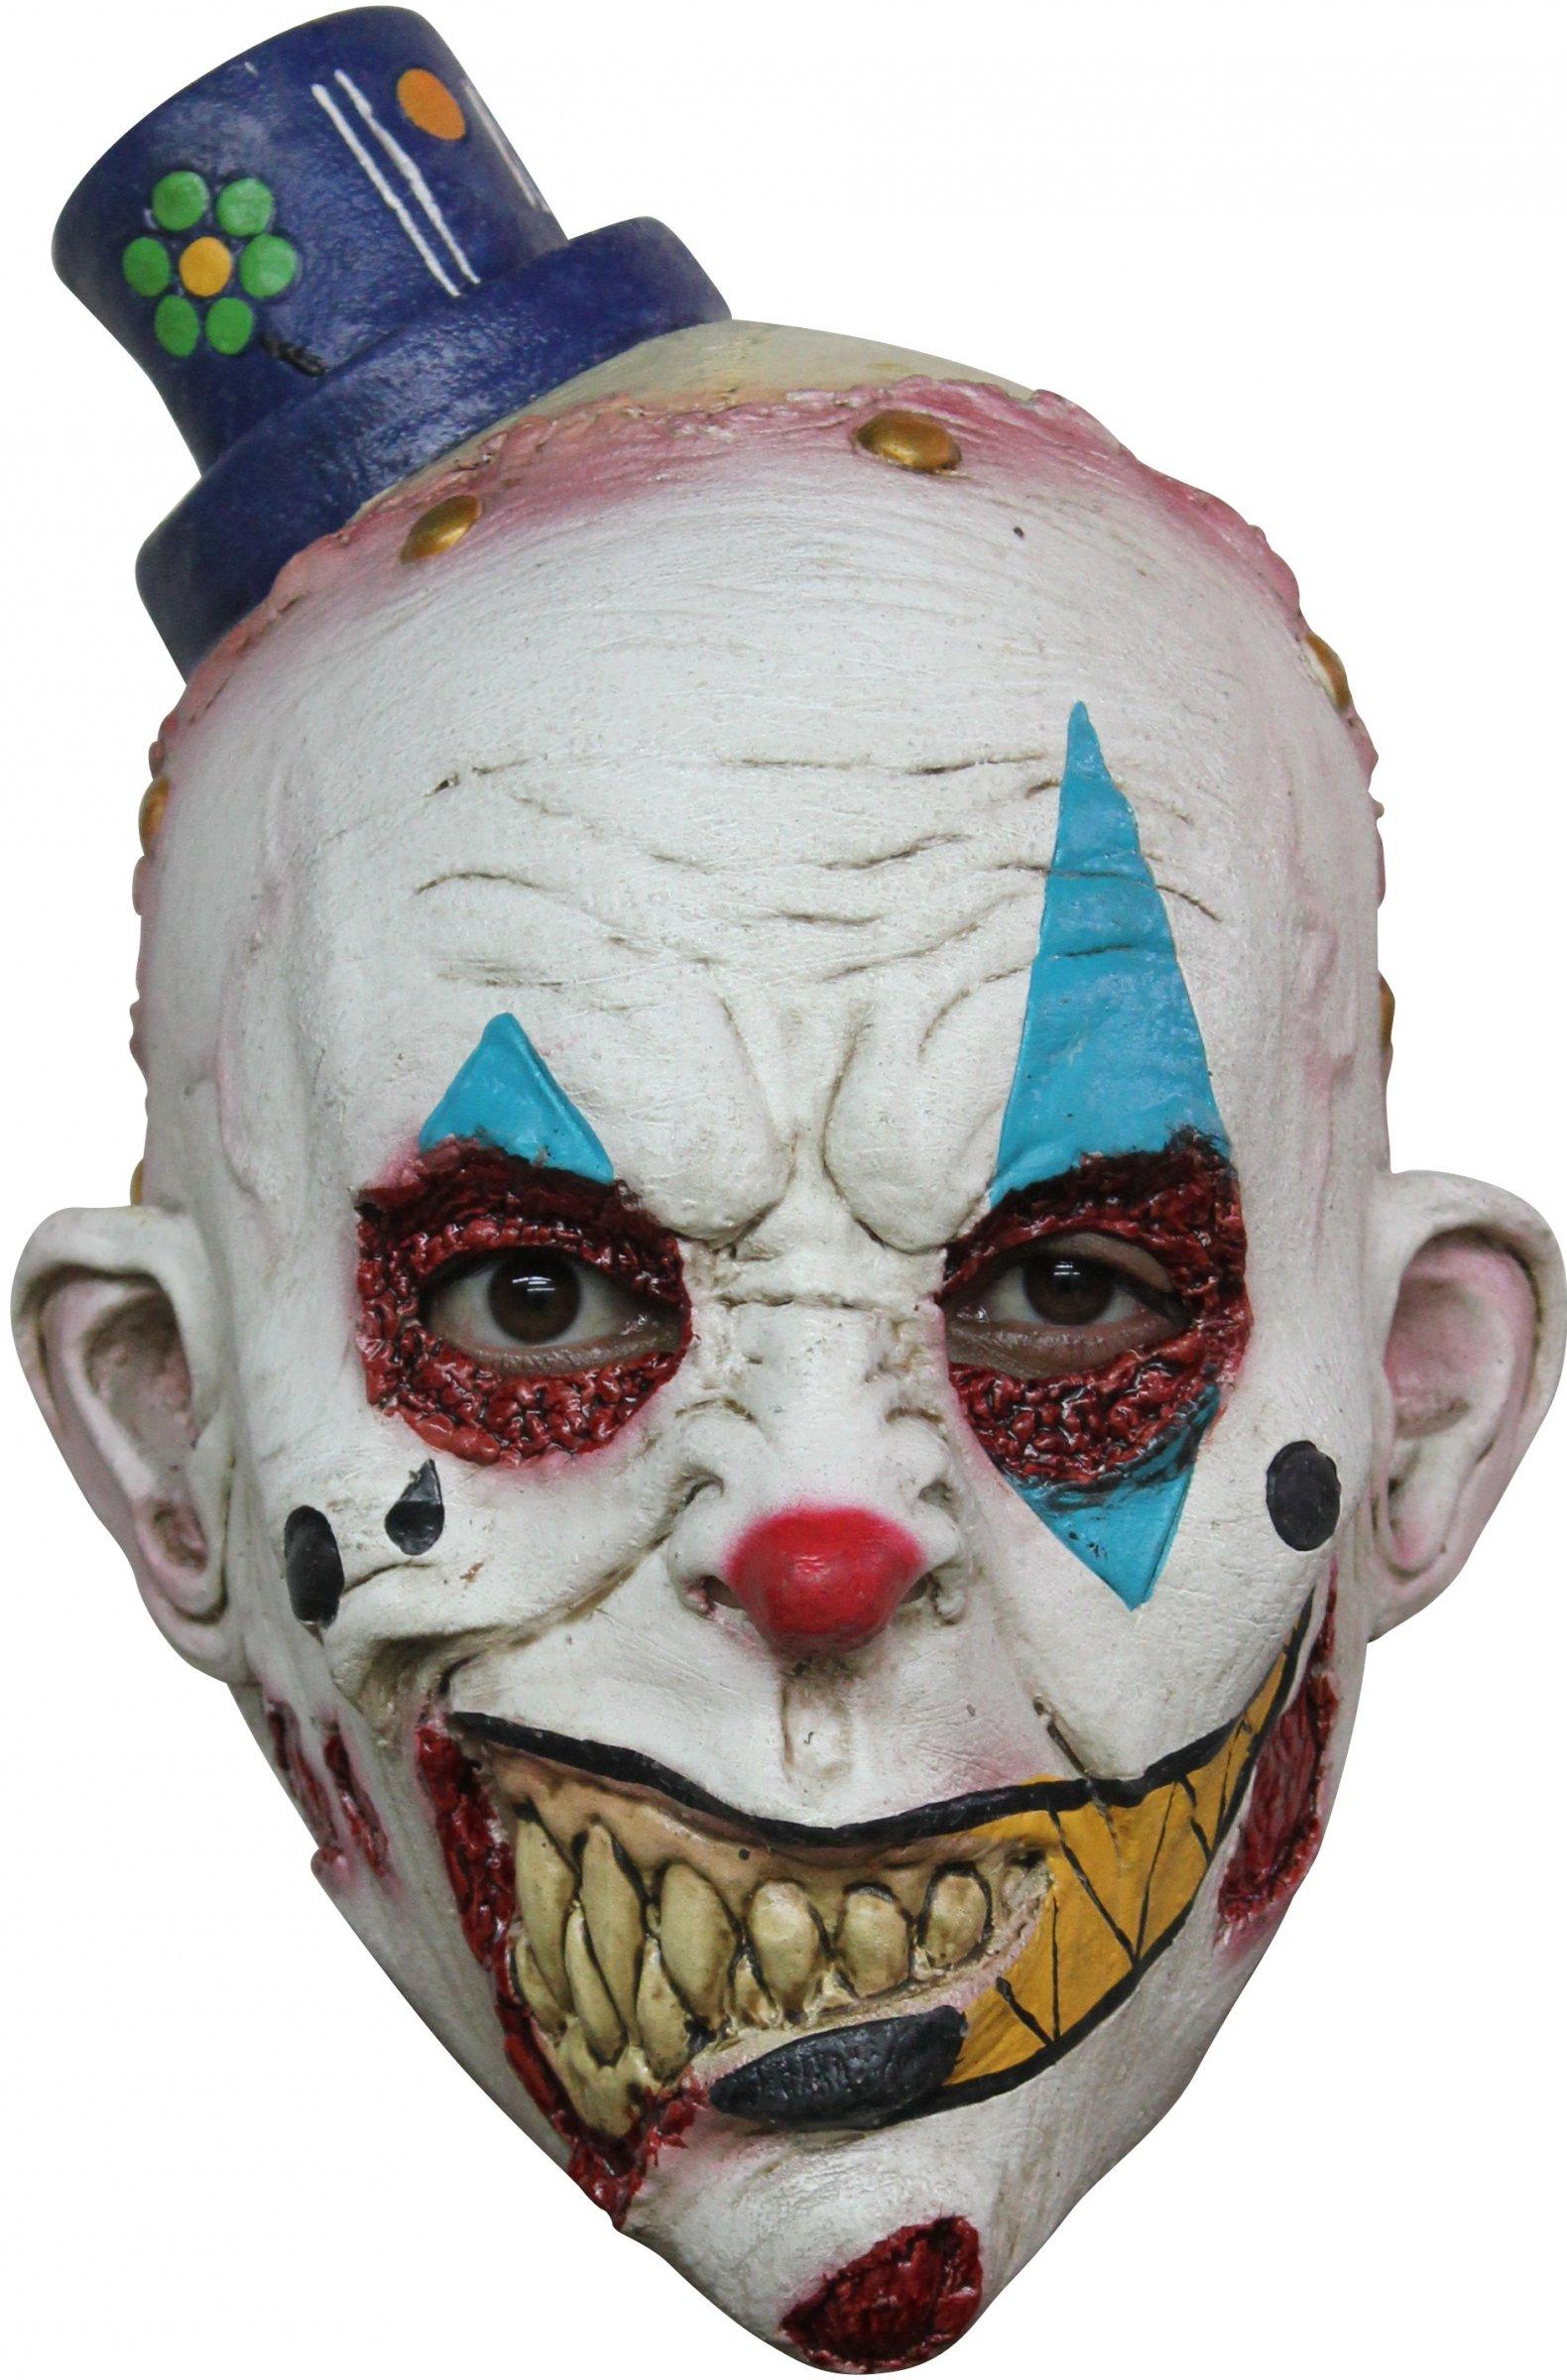 Mscara de payaso asustadizo nio Halloween Mscarasy disfraces